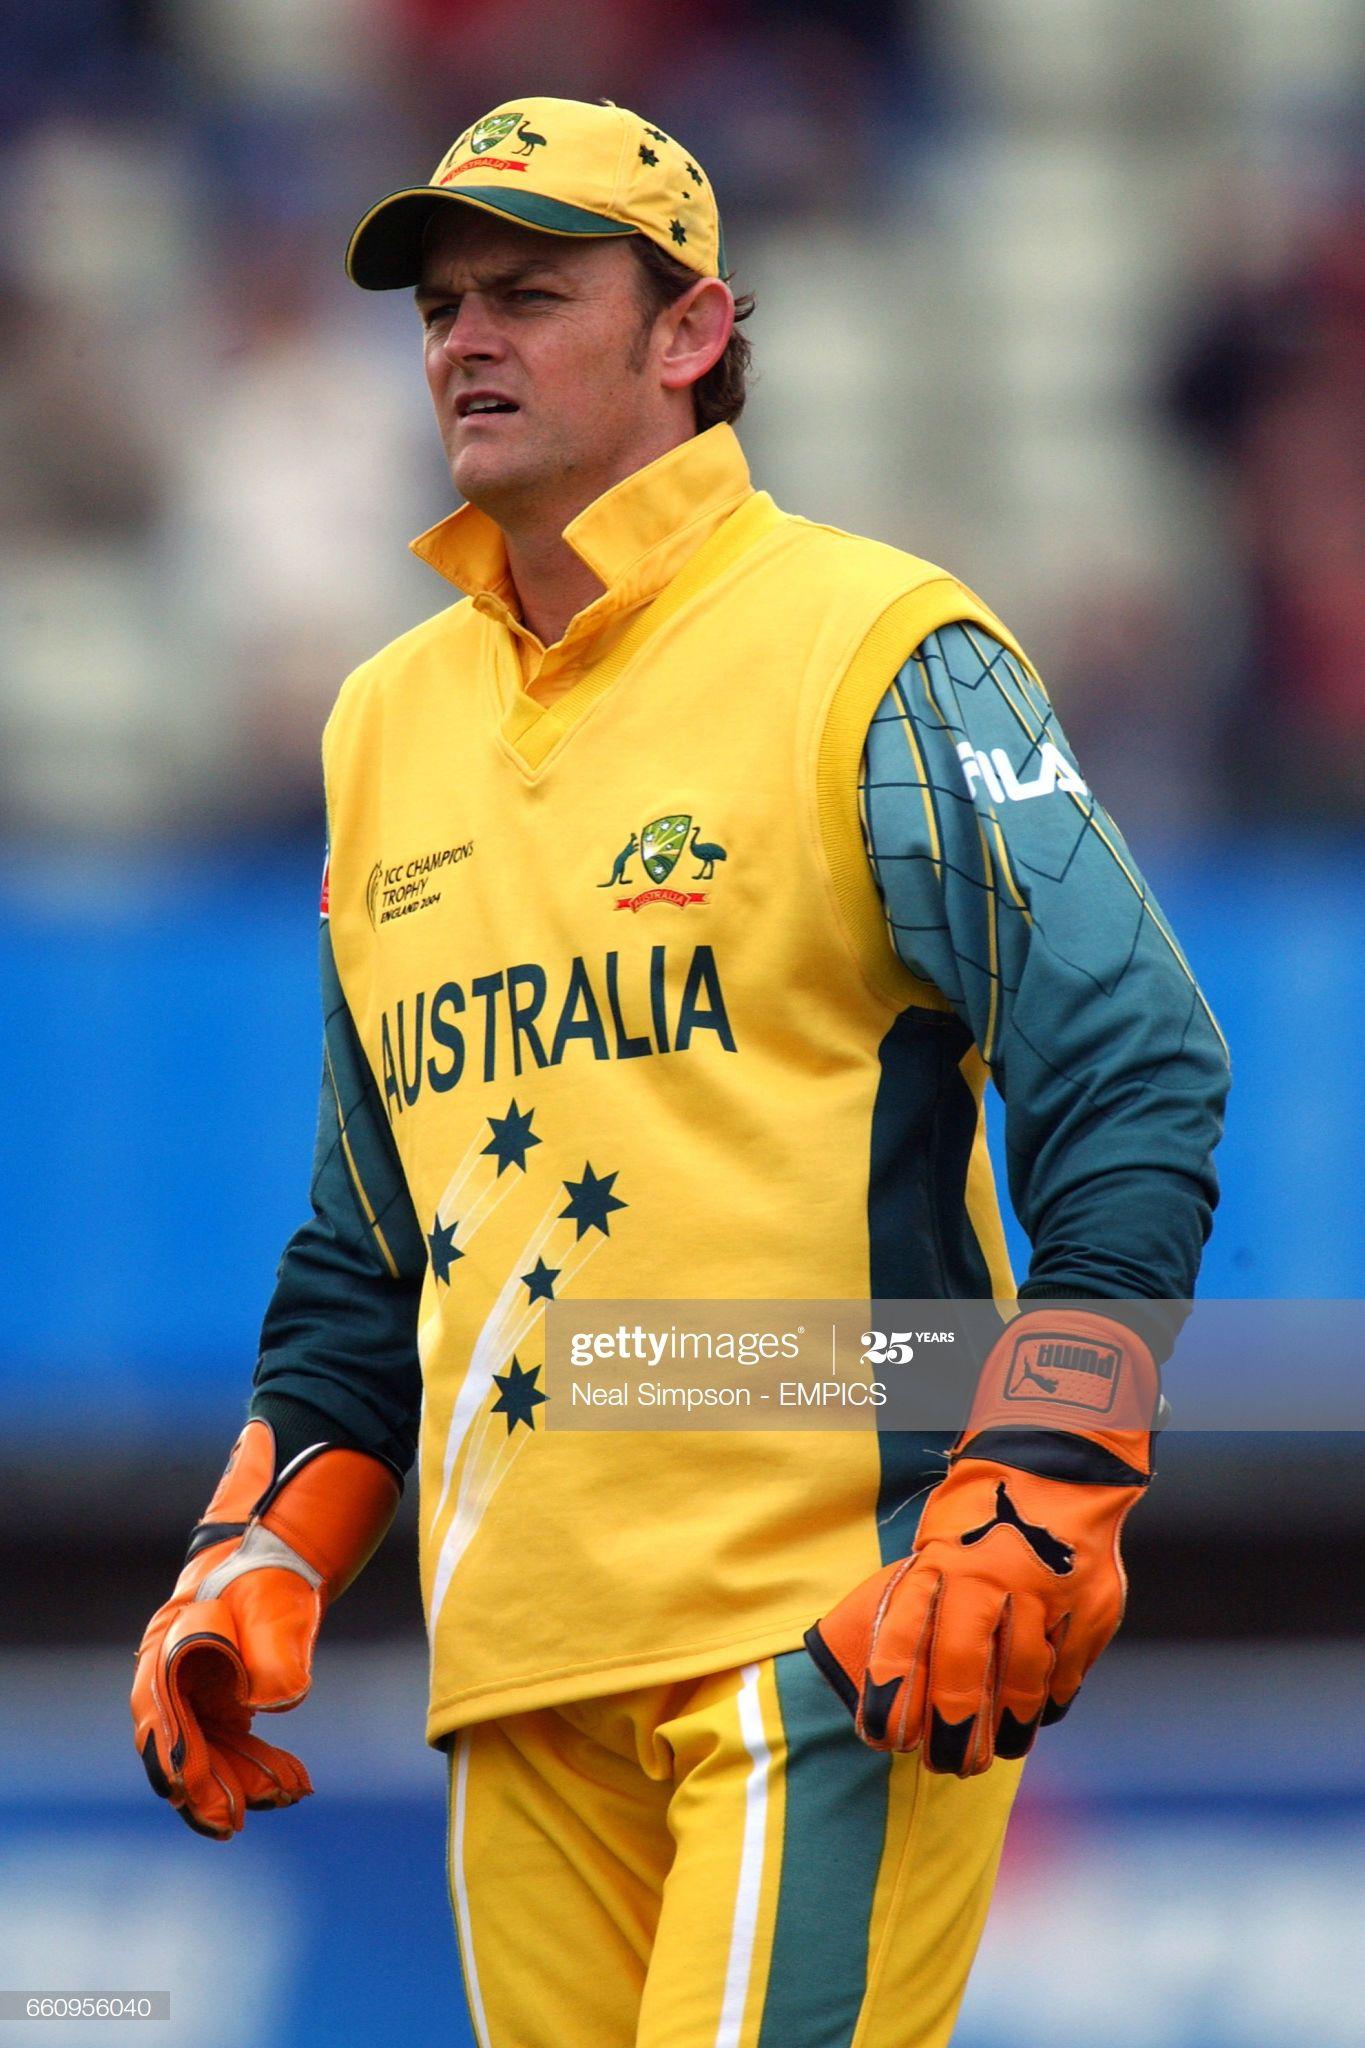 News Photo Adam Gilchrist Australia In 2021 Adam Gilchrist Cricket Wallpapers Cricket World Cup Adam gilchrist hd wallpaper